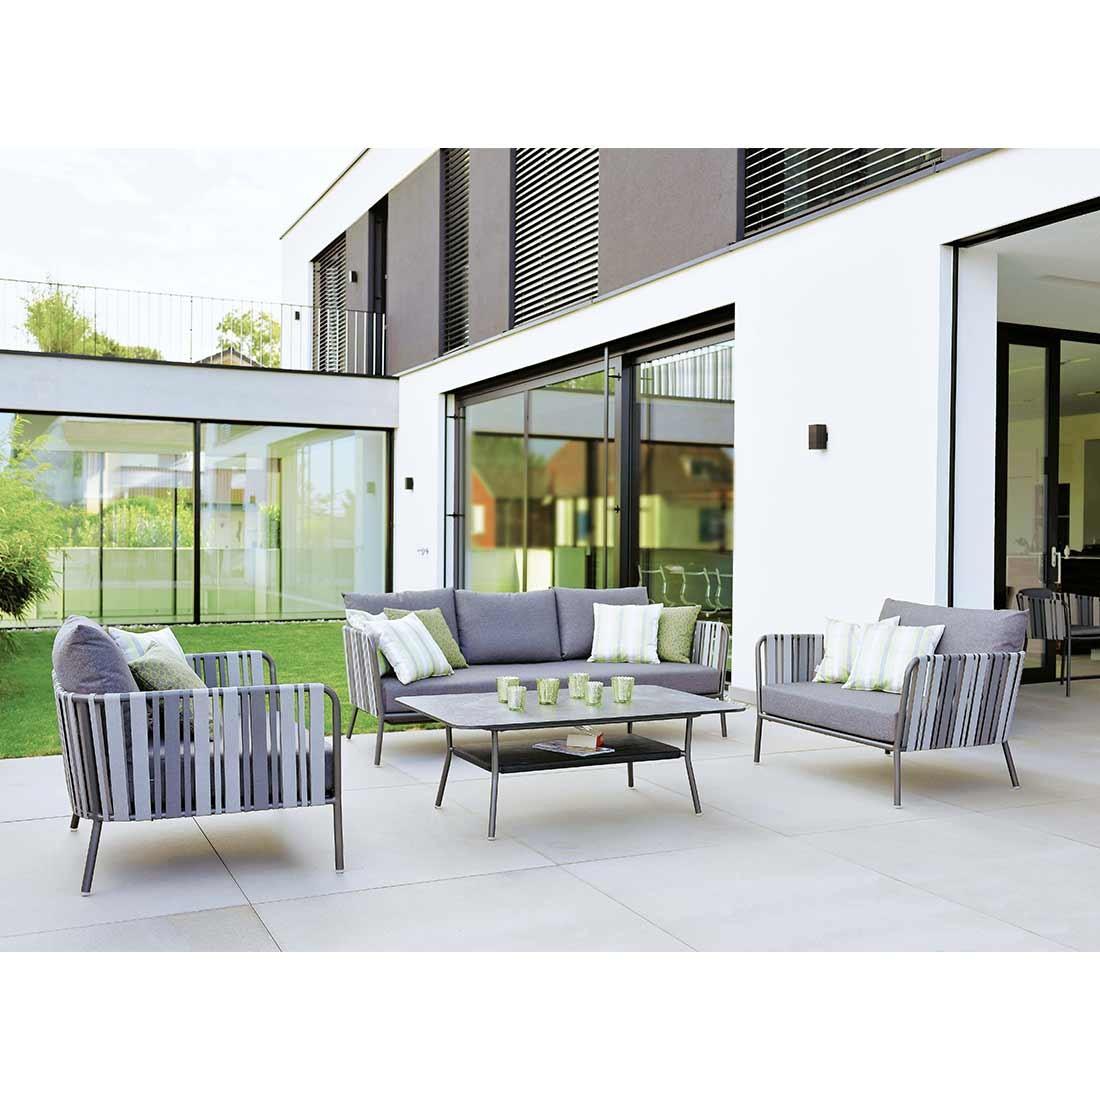 Full Size of Loungemöbel Alu Stern Space Sofagruppe 4 Teilig Aluminium Gurtbespannung Garten Fenster Holz Aluplast Preise Günstig Verbundplatte Küche Wohnzimmer Loungemöbel Alu